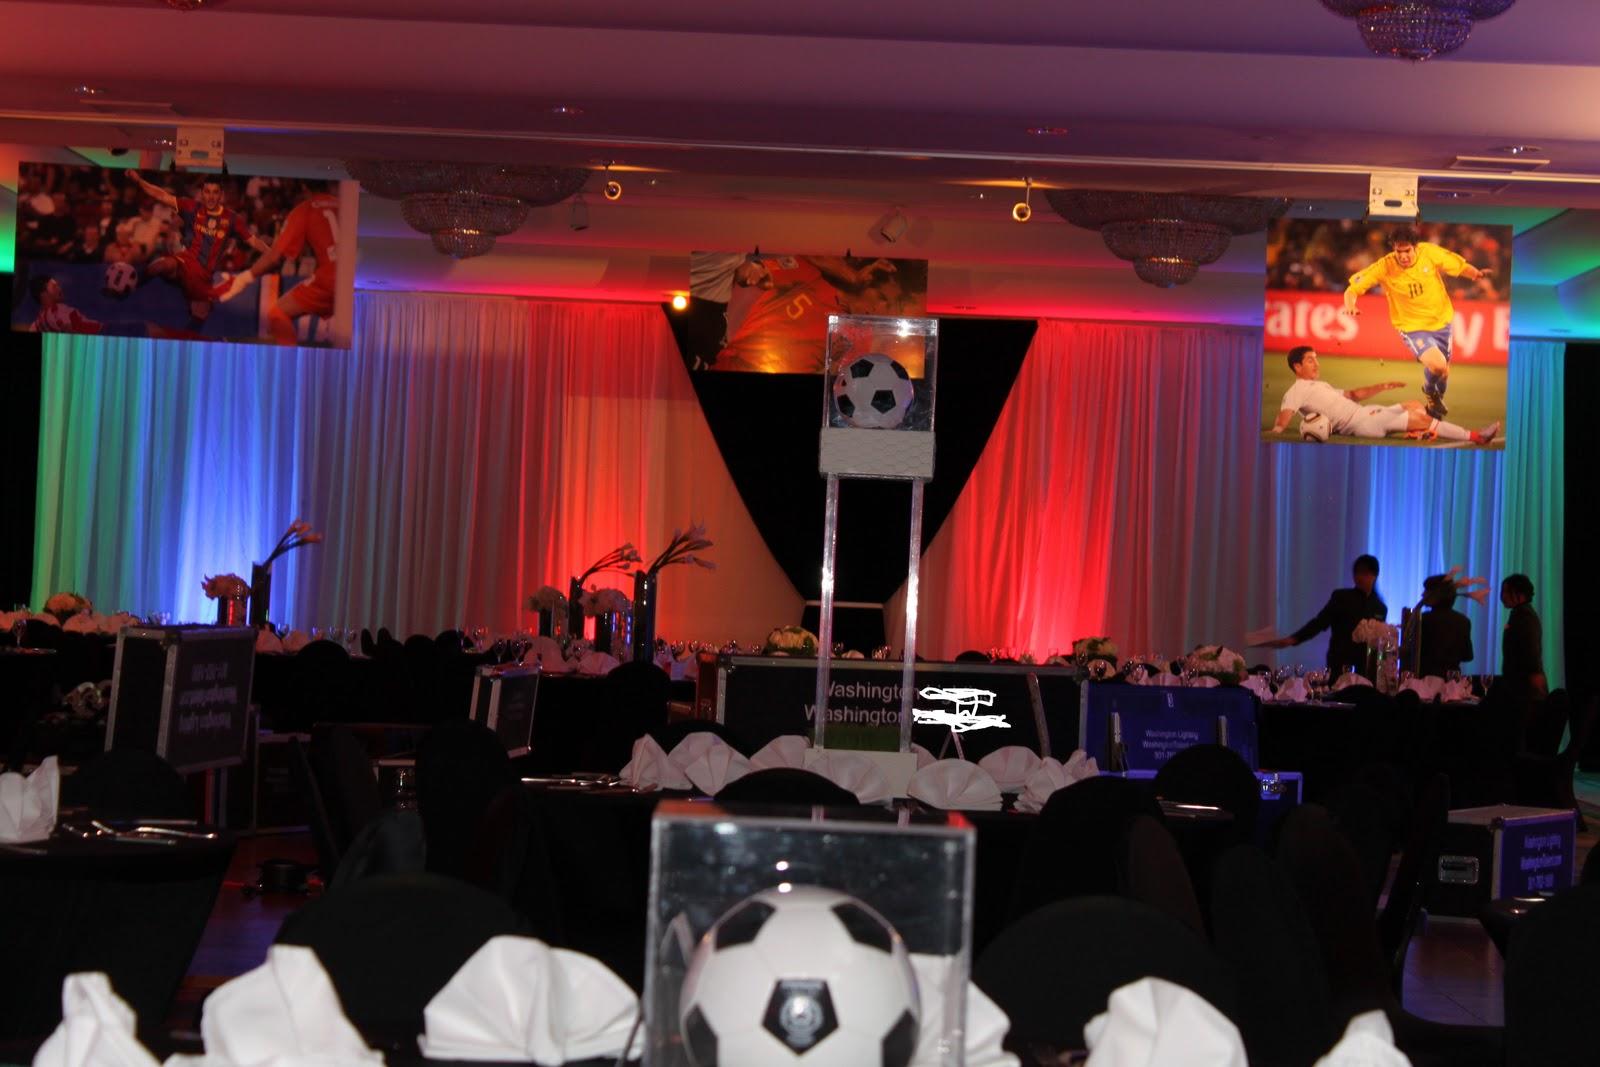 Soccer Themed Wedding Ideas: Weddings Florist Washington Dc